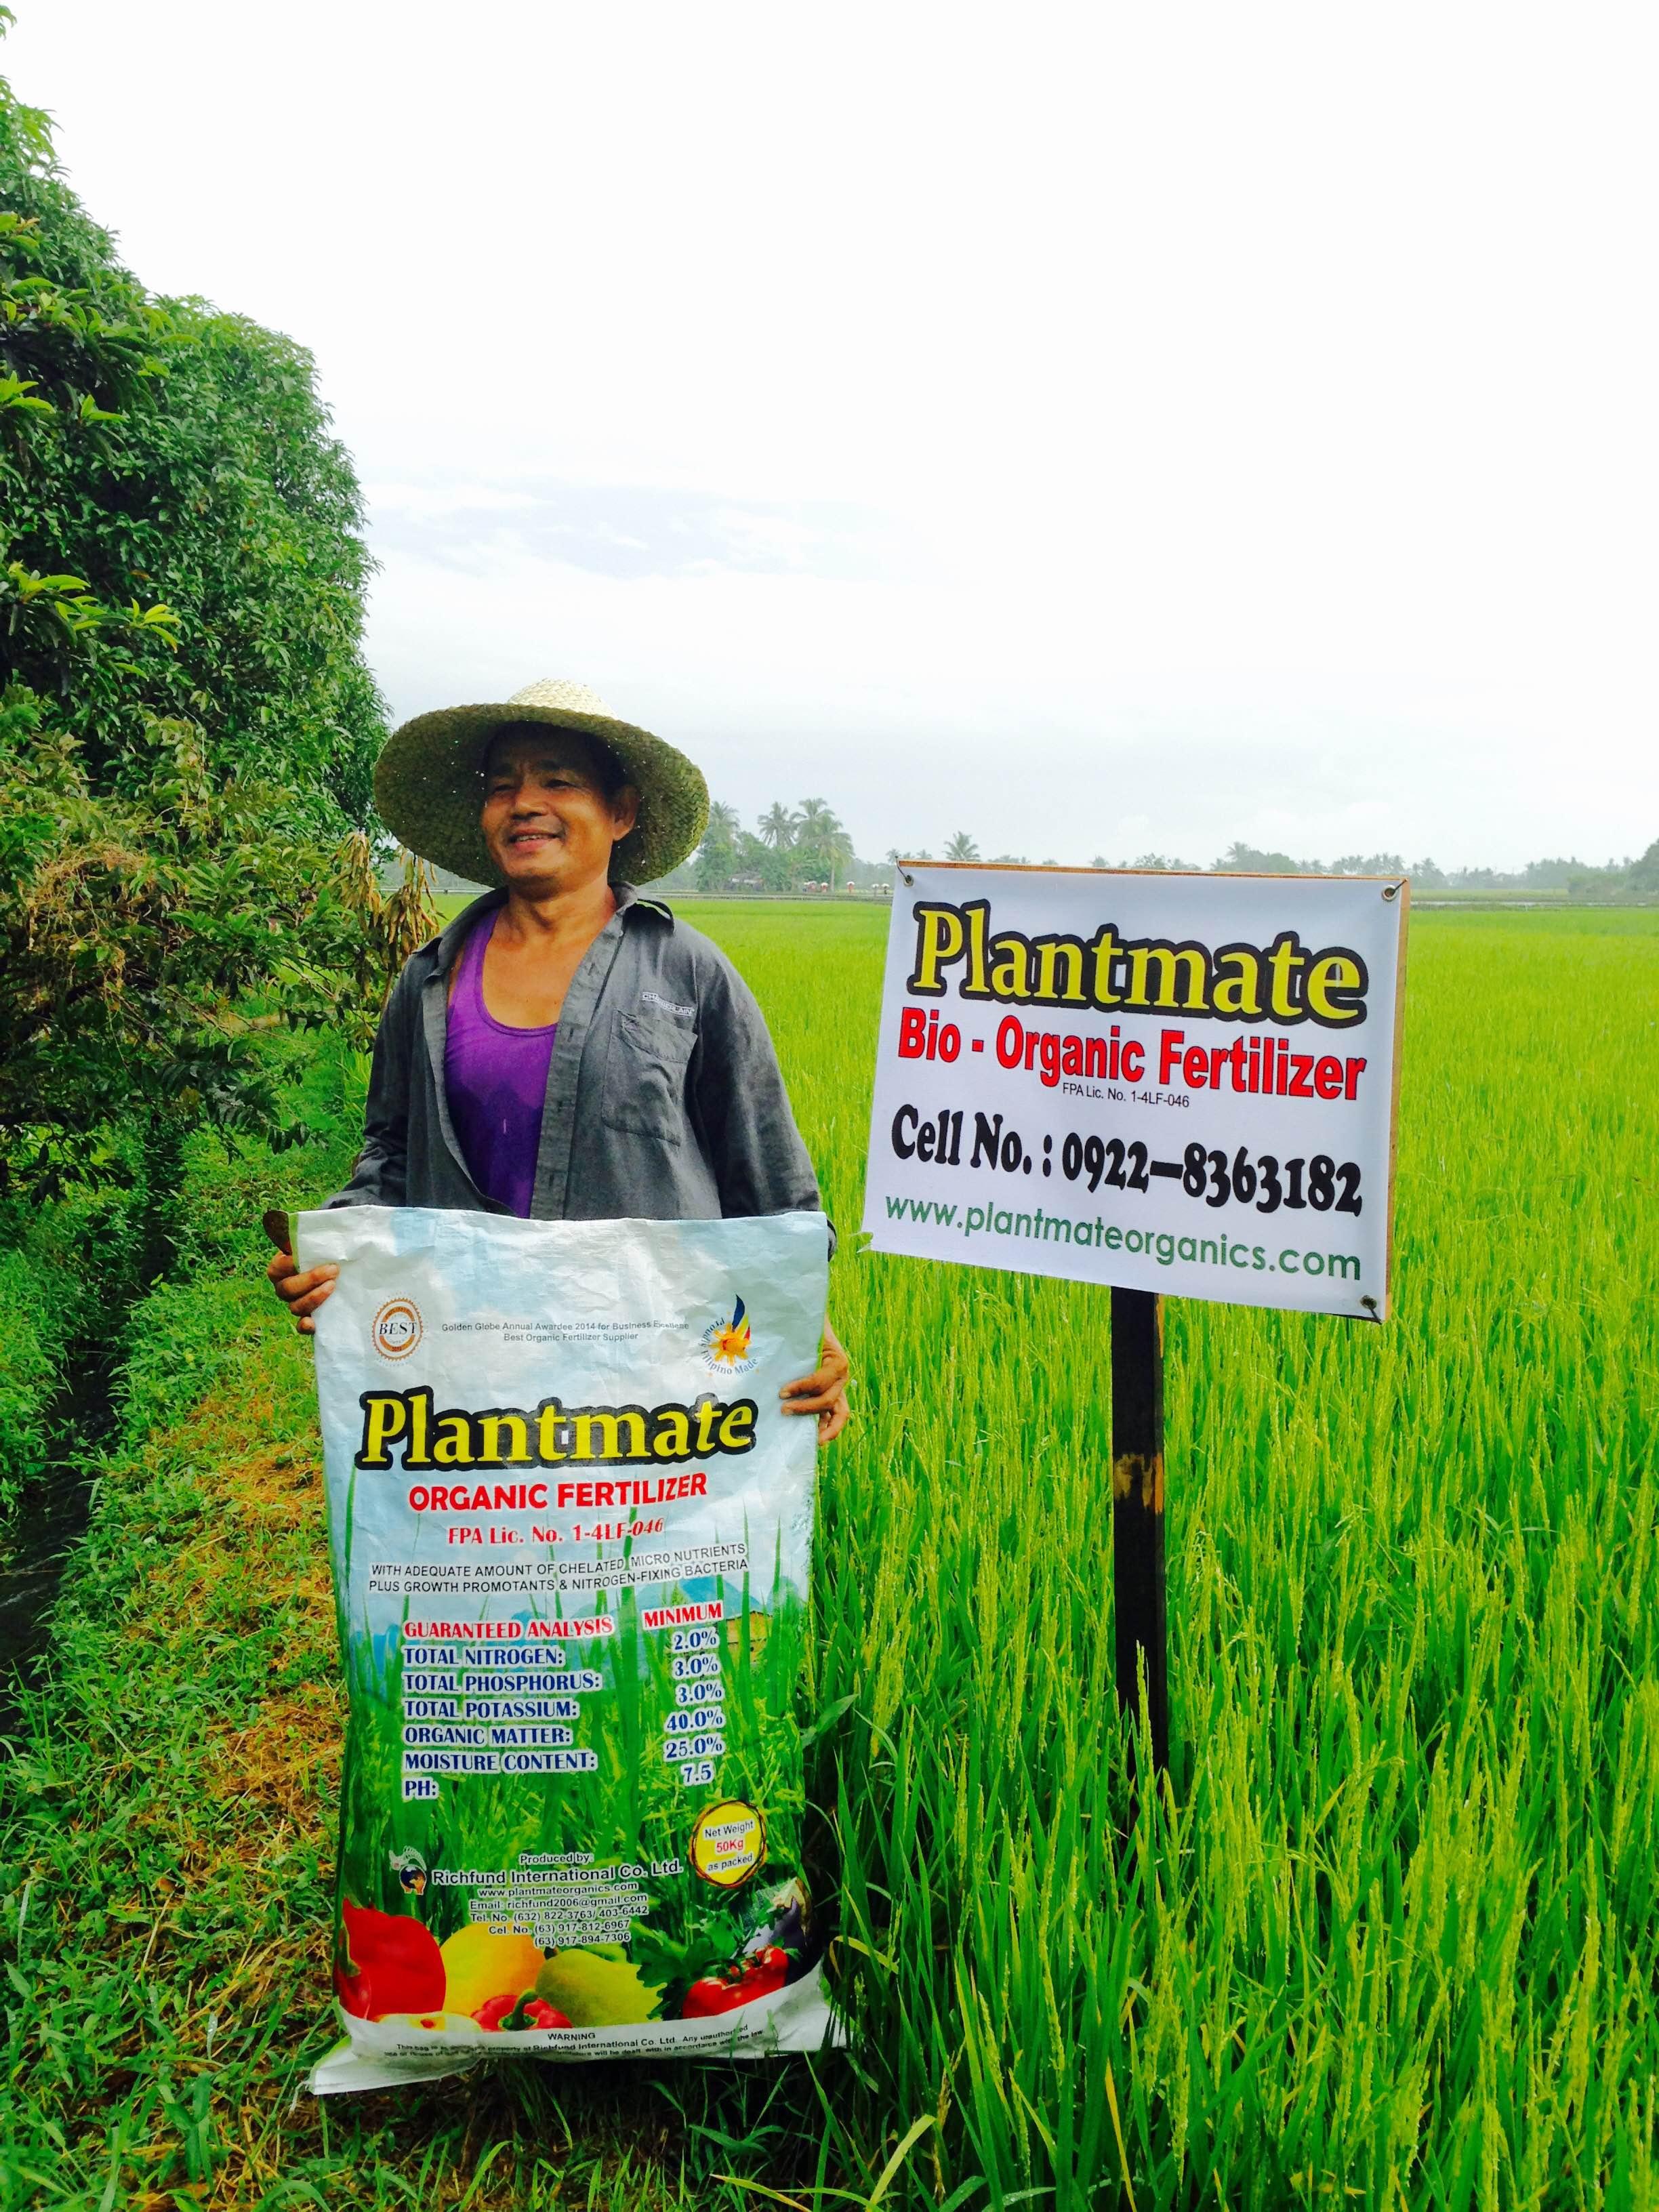 Plantmate Organic Fertilizer | Plant Mate Organic Fertilizer